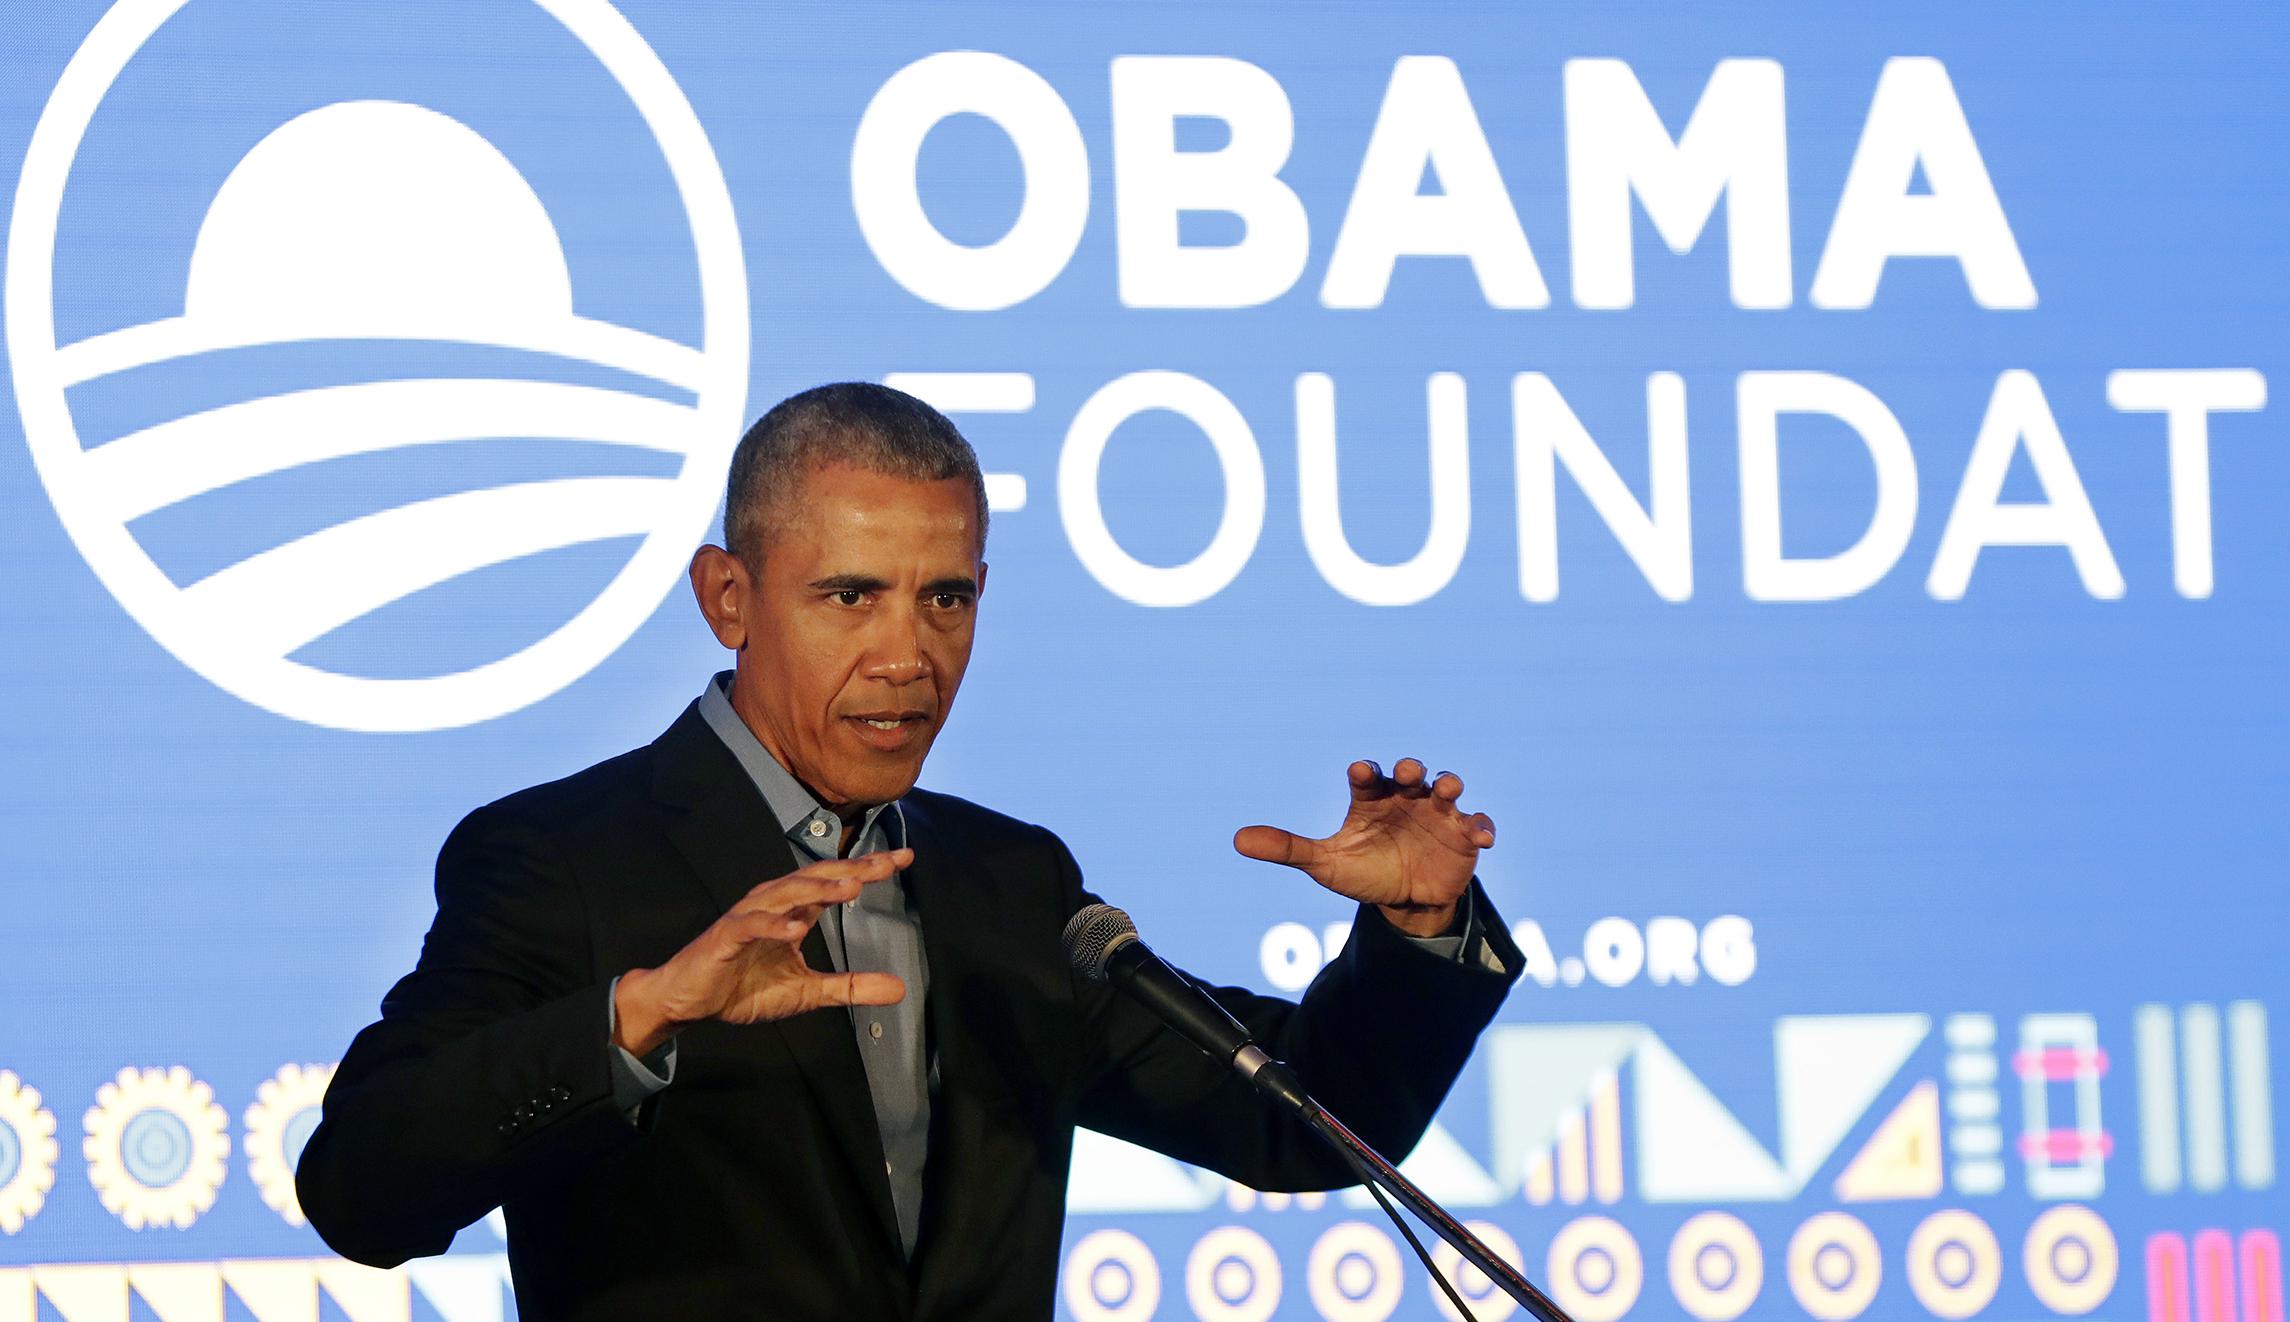 washingtonexaminer.com - Obama: 'Men have been getting on my nerves lately'